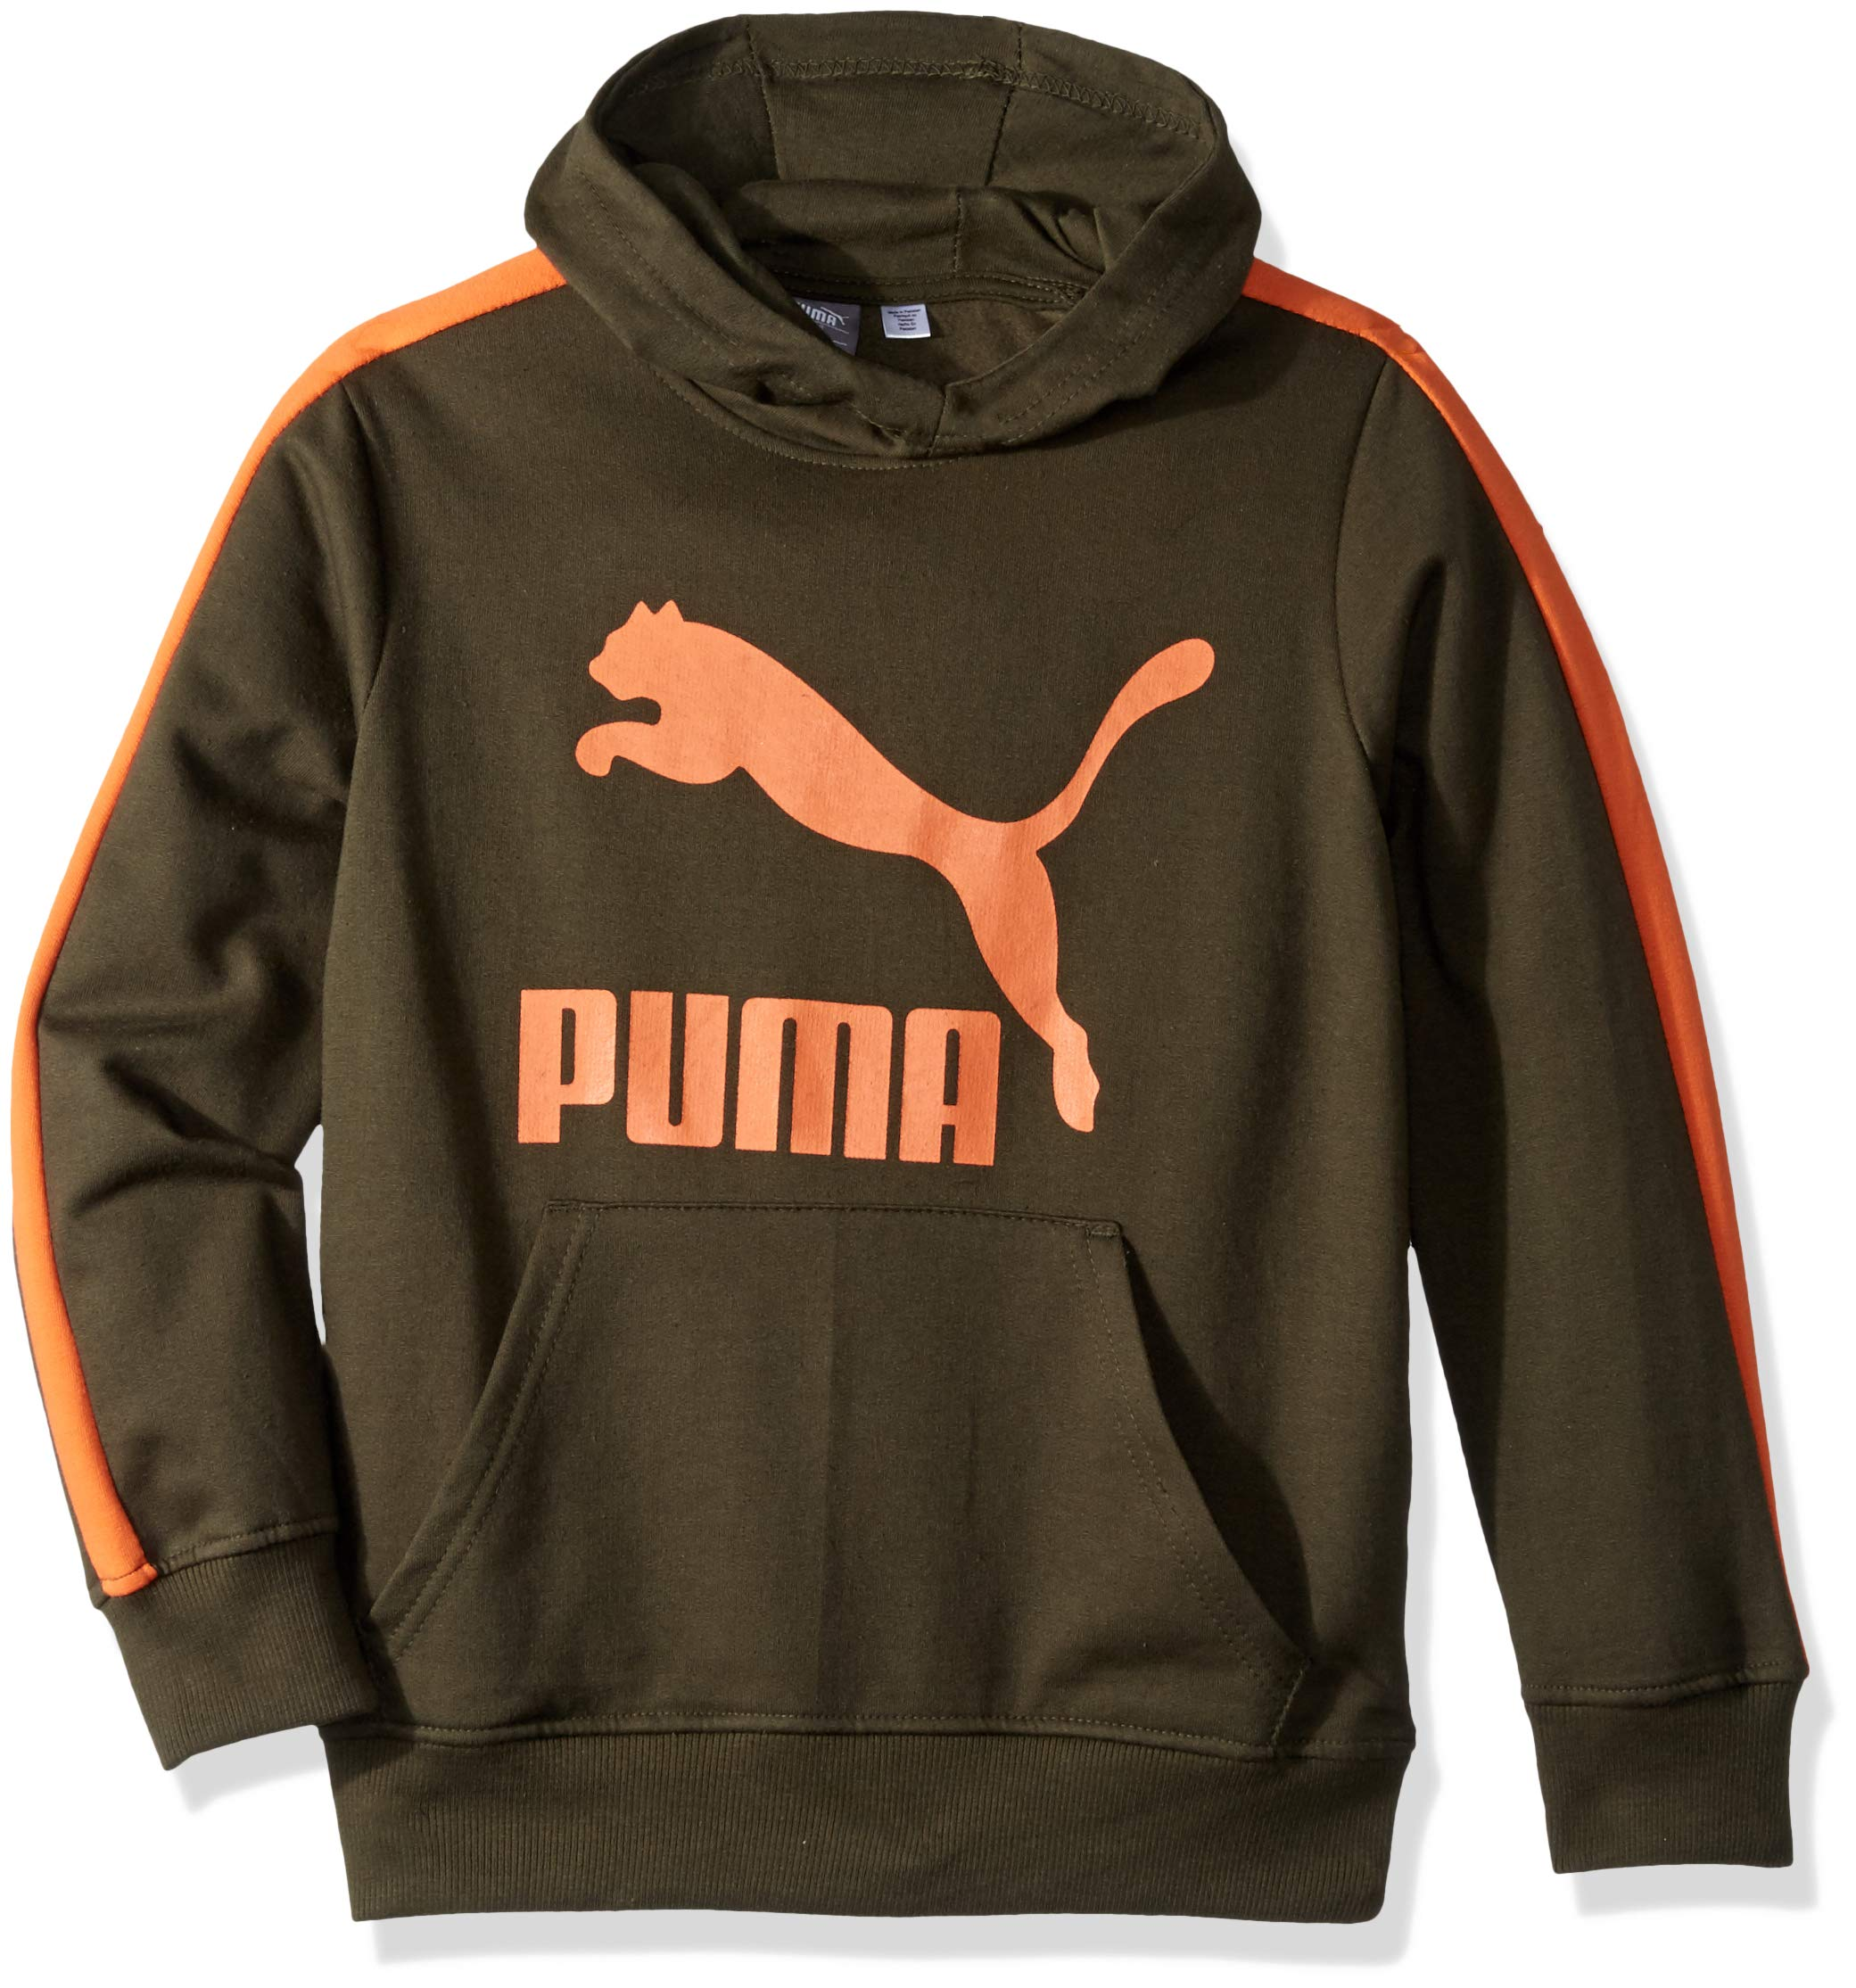 PUMA Big Boys' Fleece Pullover Hoodie, Forest Night, M